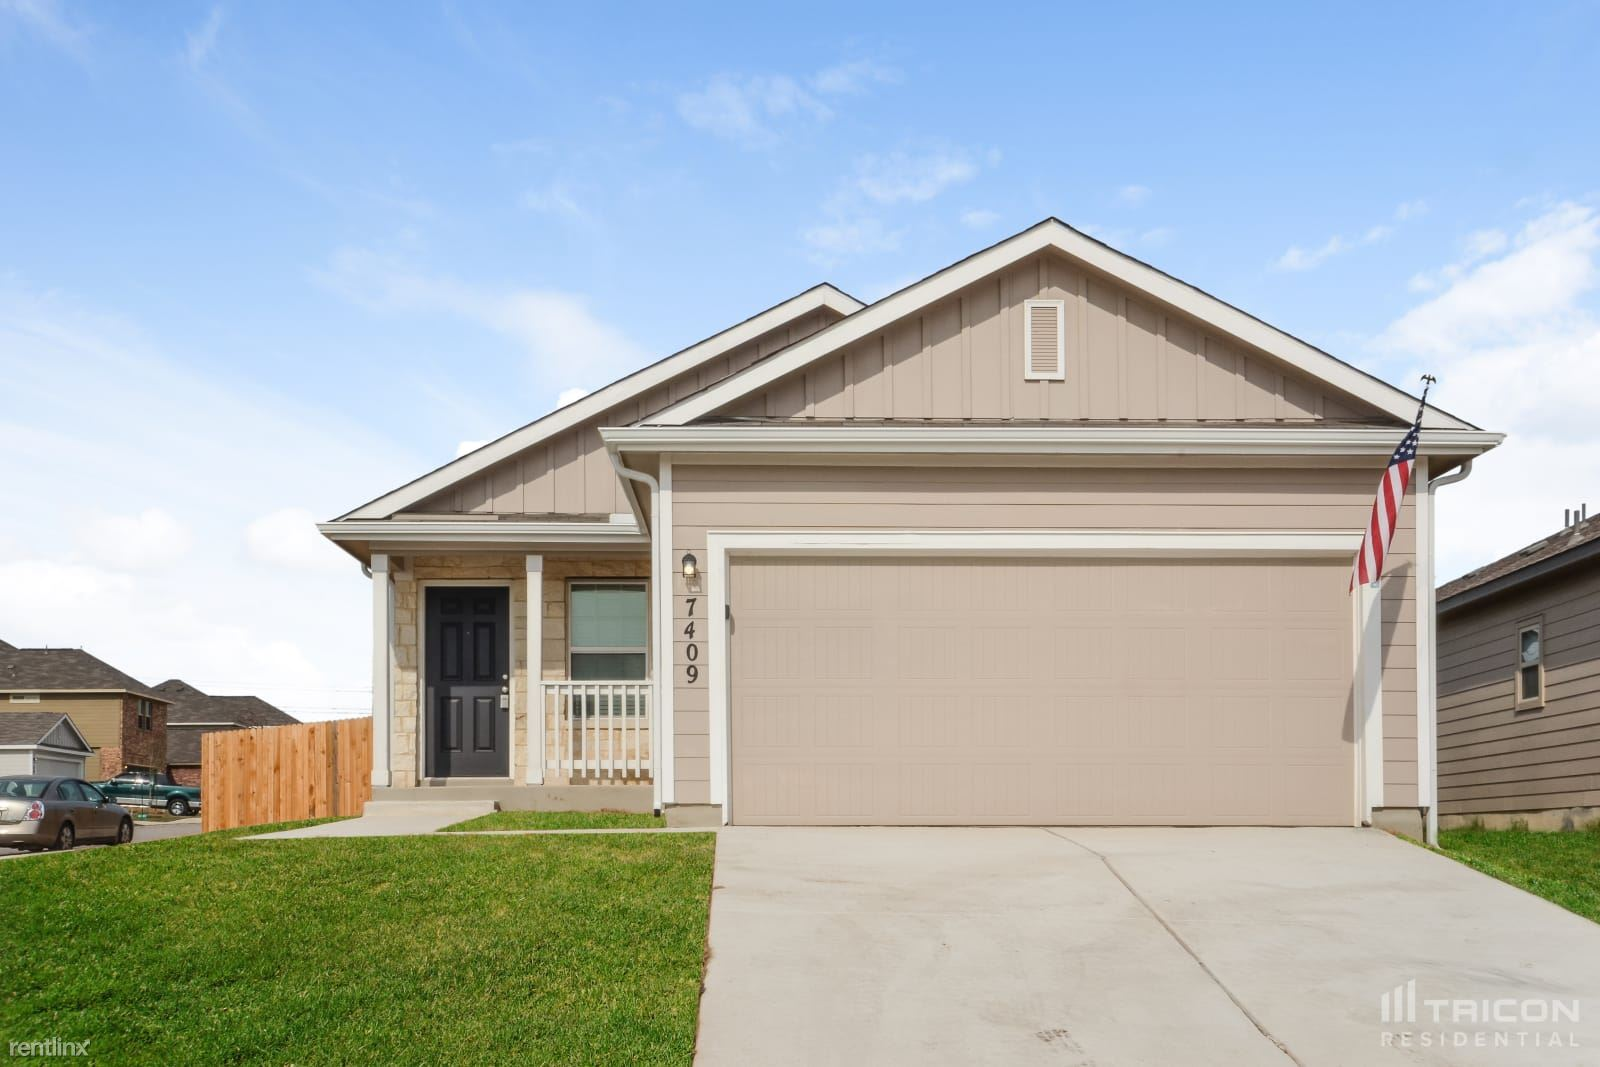 7409 Summer Blossom Court, San Antonio, TX - 1,699 USD/ month